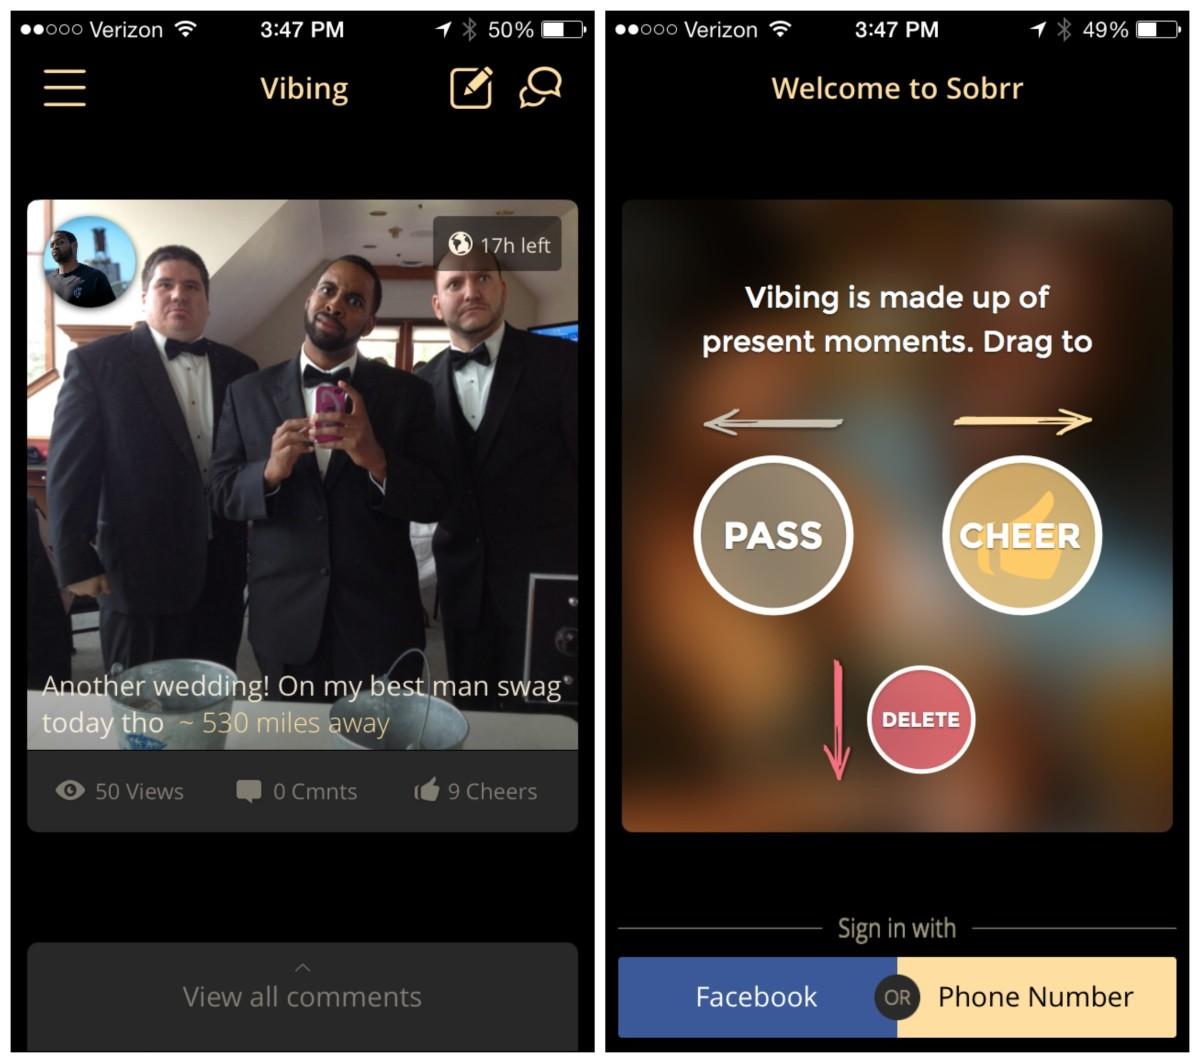 sobrr-app-screen.jpg